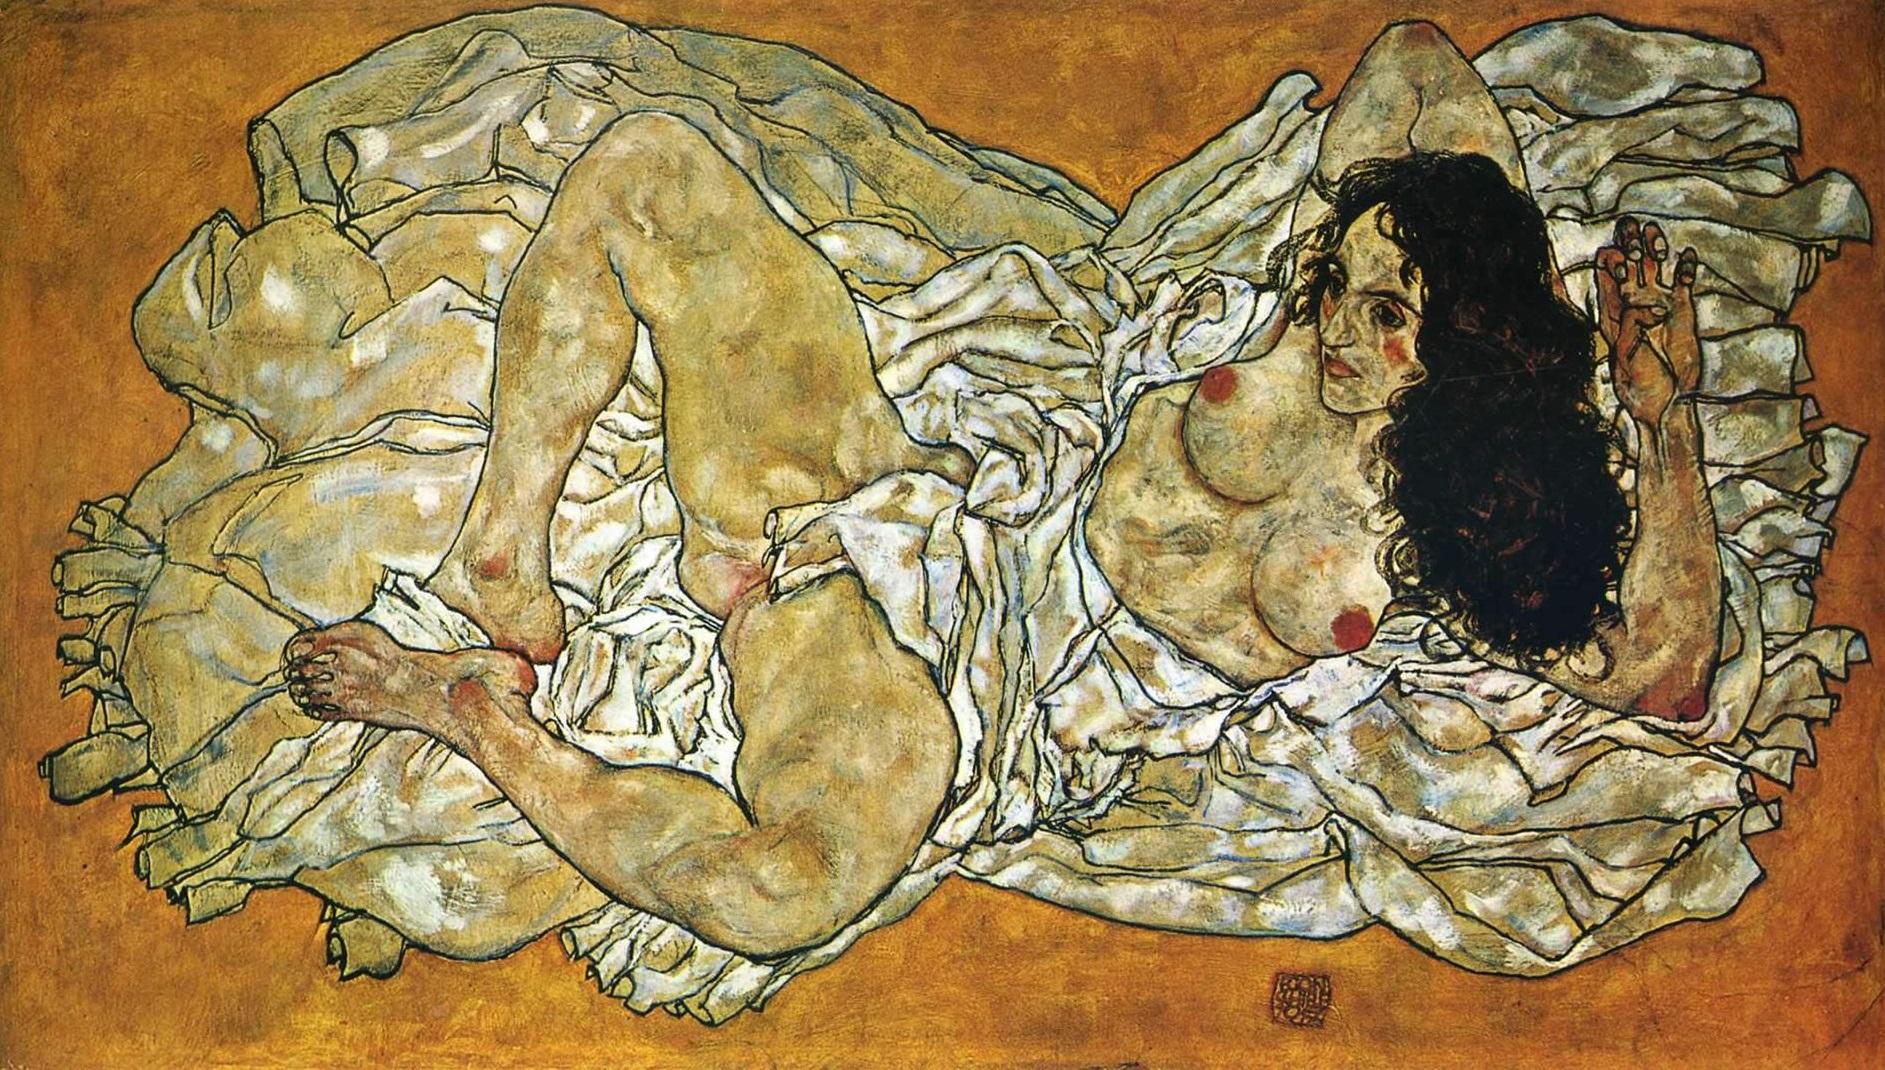 Mengetahui Karya Seni Oleh Egon Schiele 2